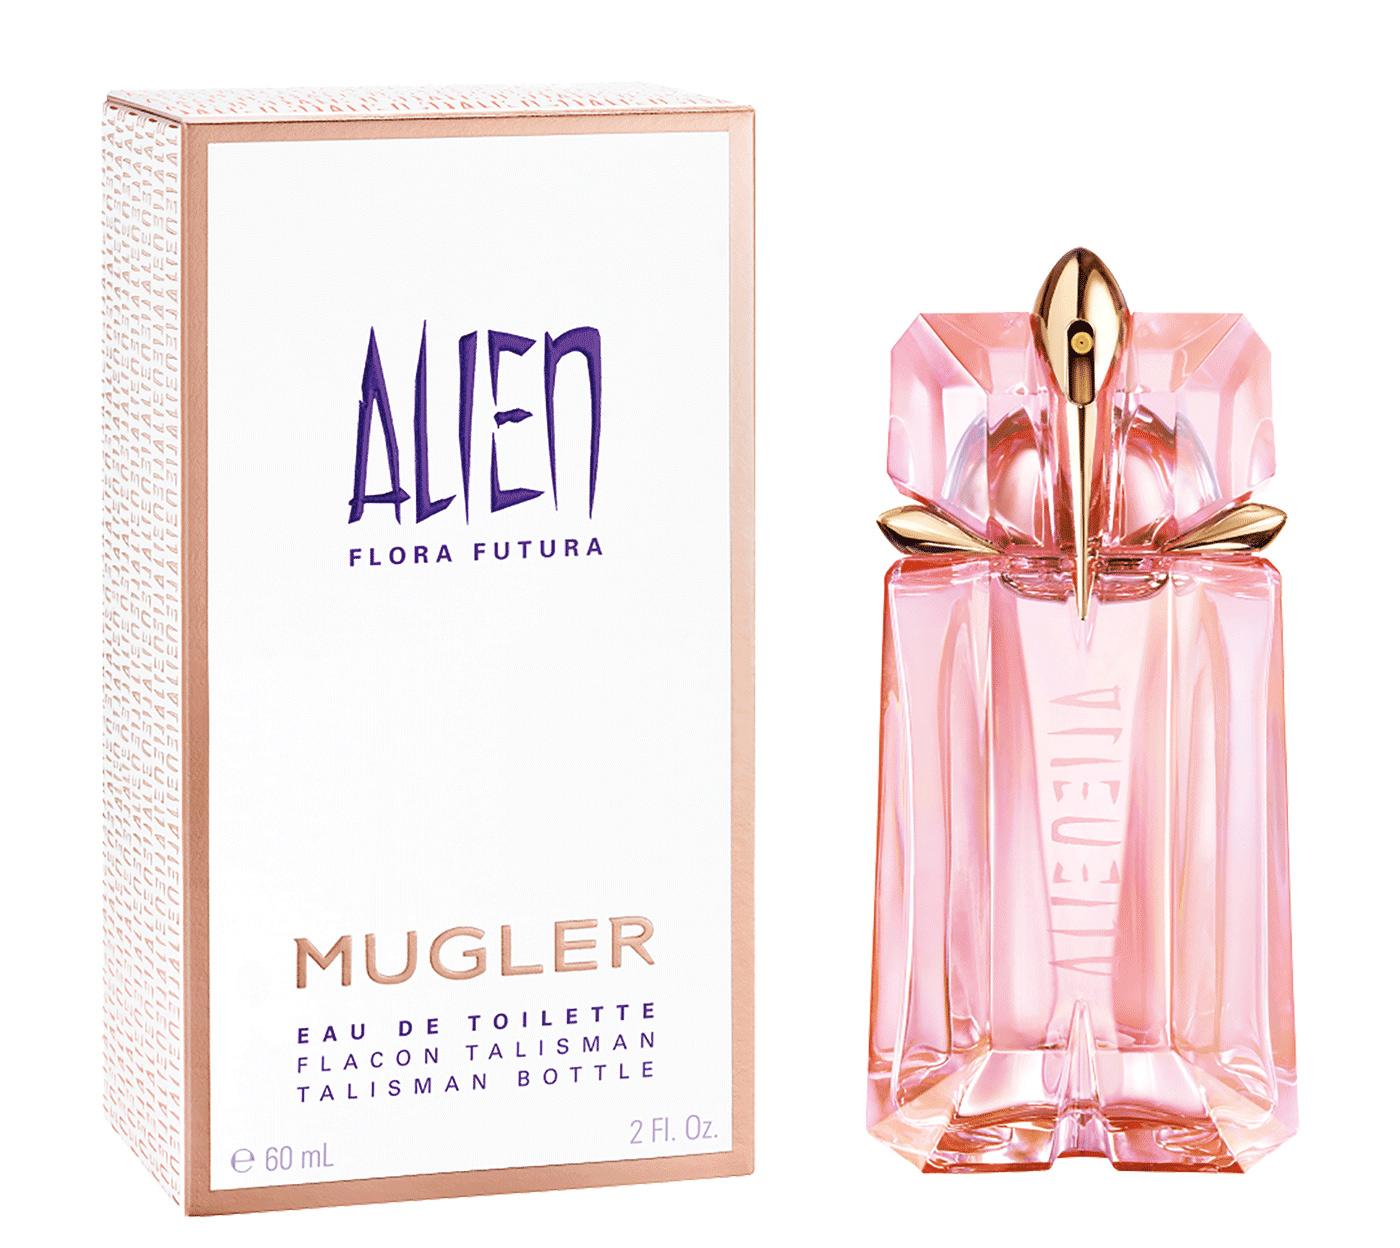 Alien Flora Futura Mugler voor dames